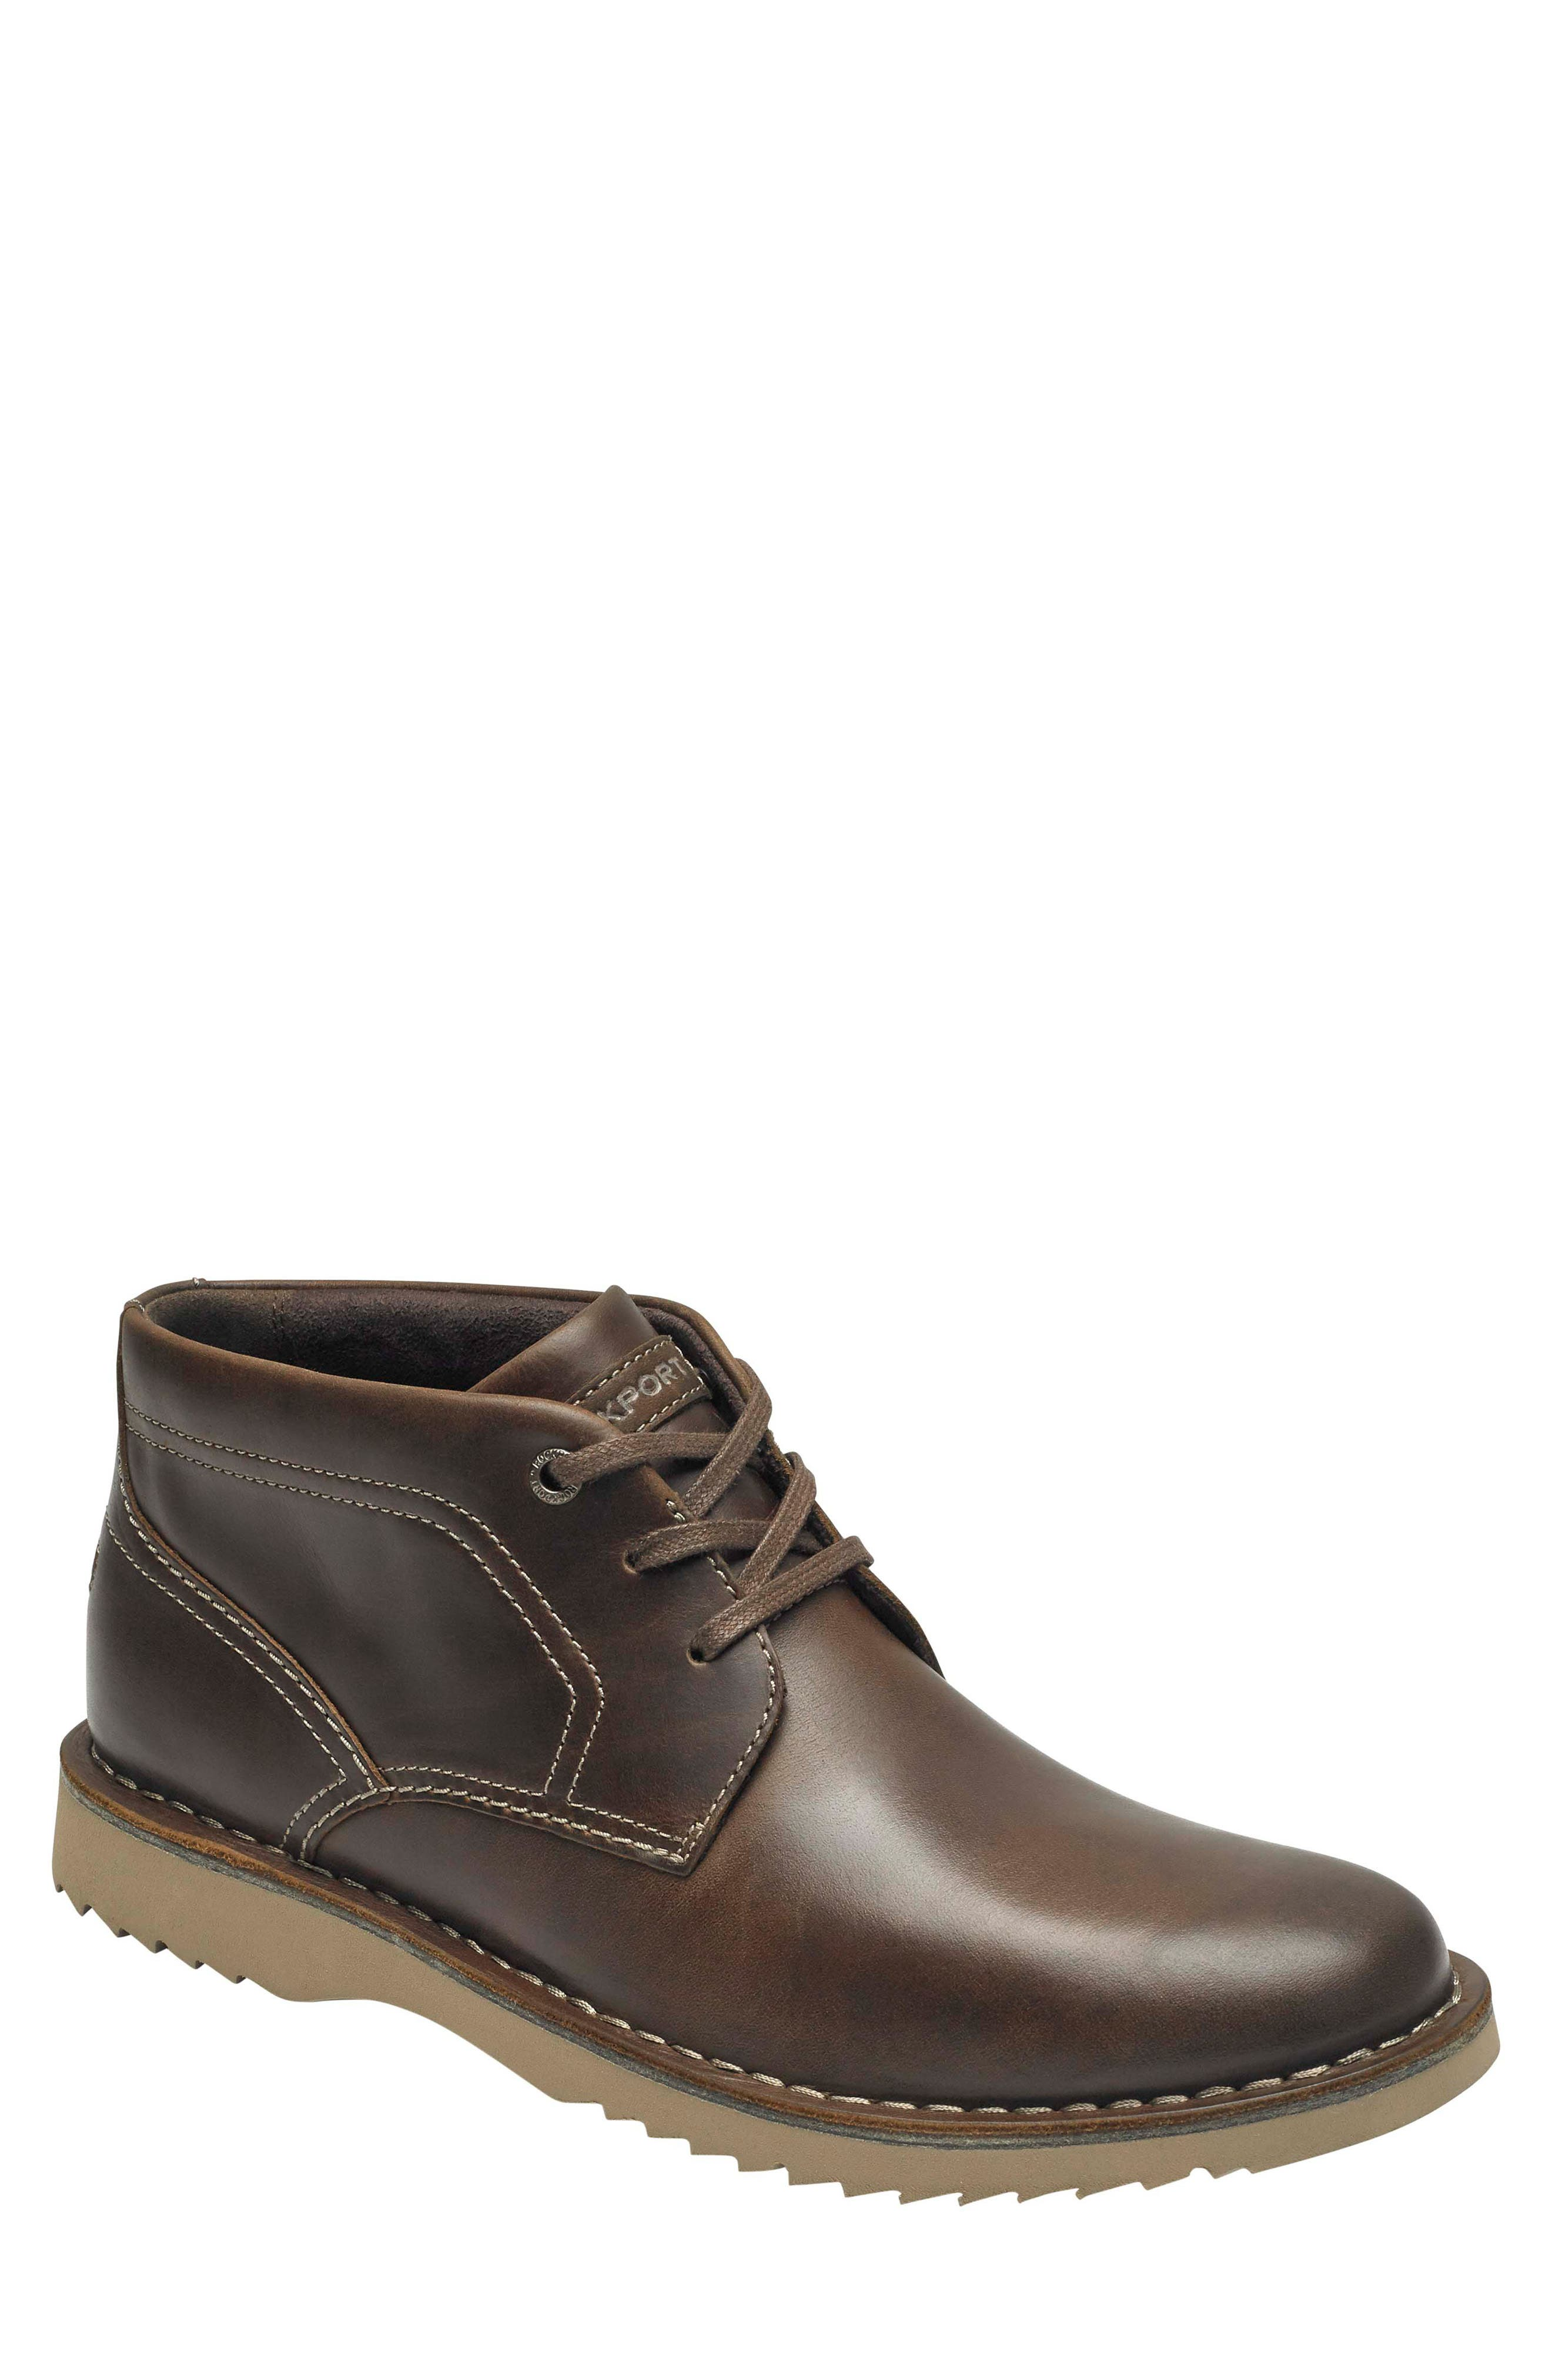 Rockport Cabot Chukka Boot